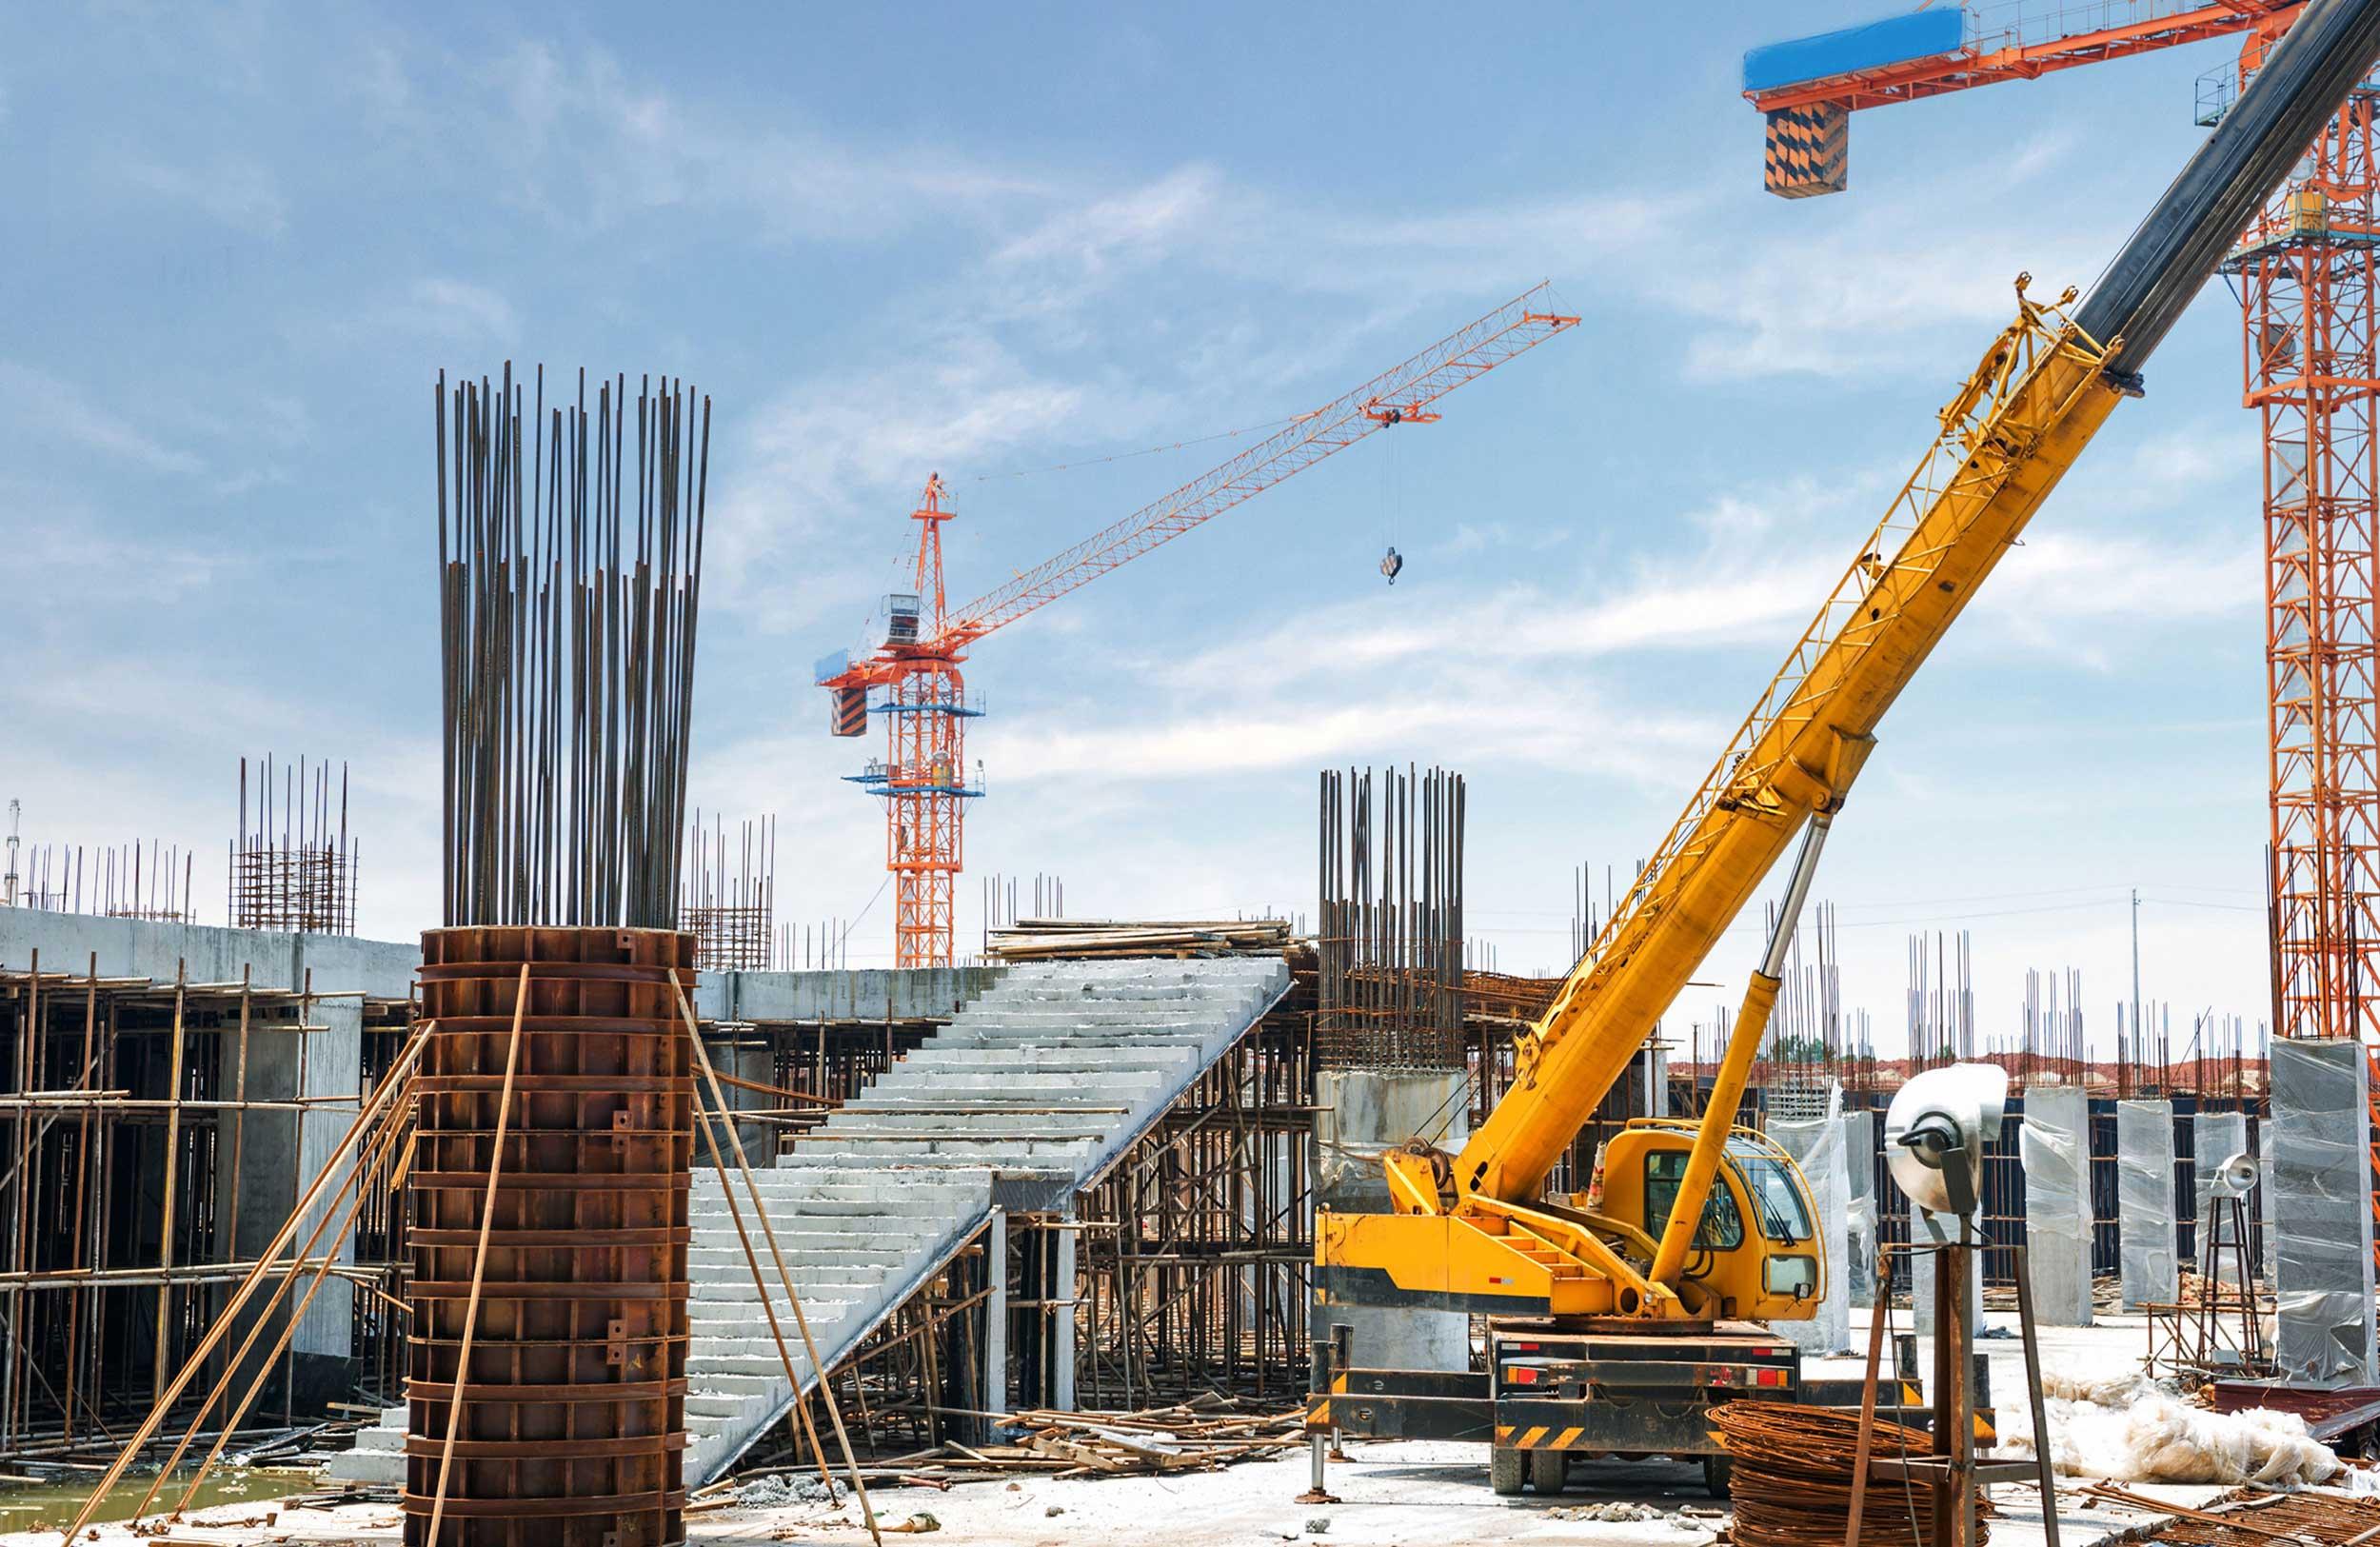 Commercial building project for Skanska in Norway